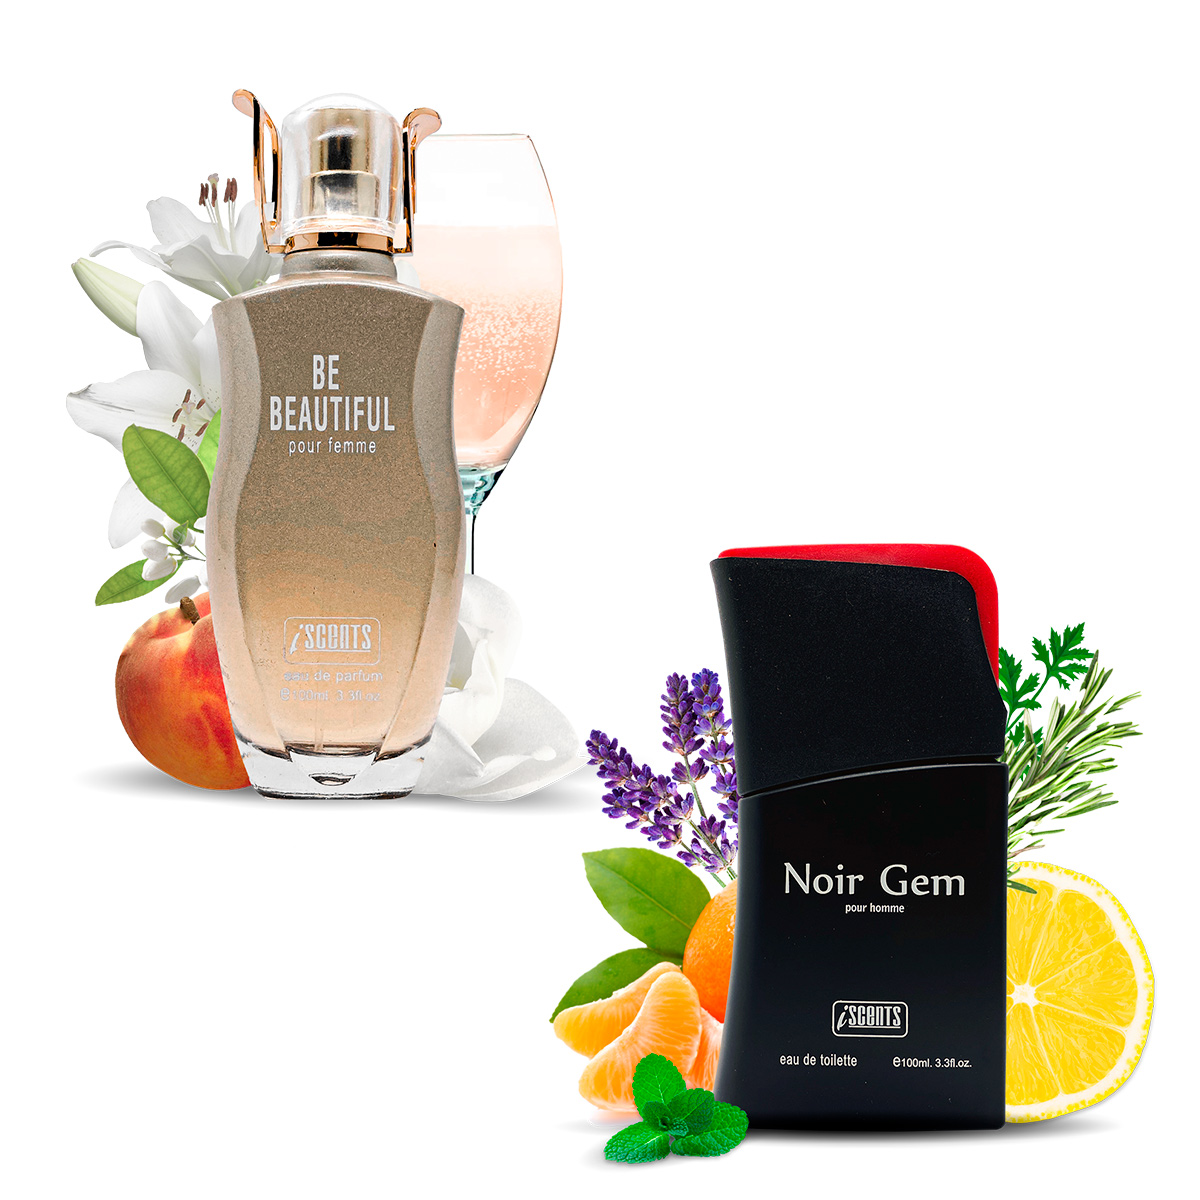 Kit 2 Perfumes Importados Be Beautiful e Noir Gem I Scents